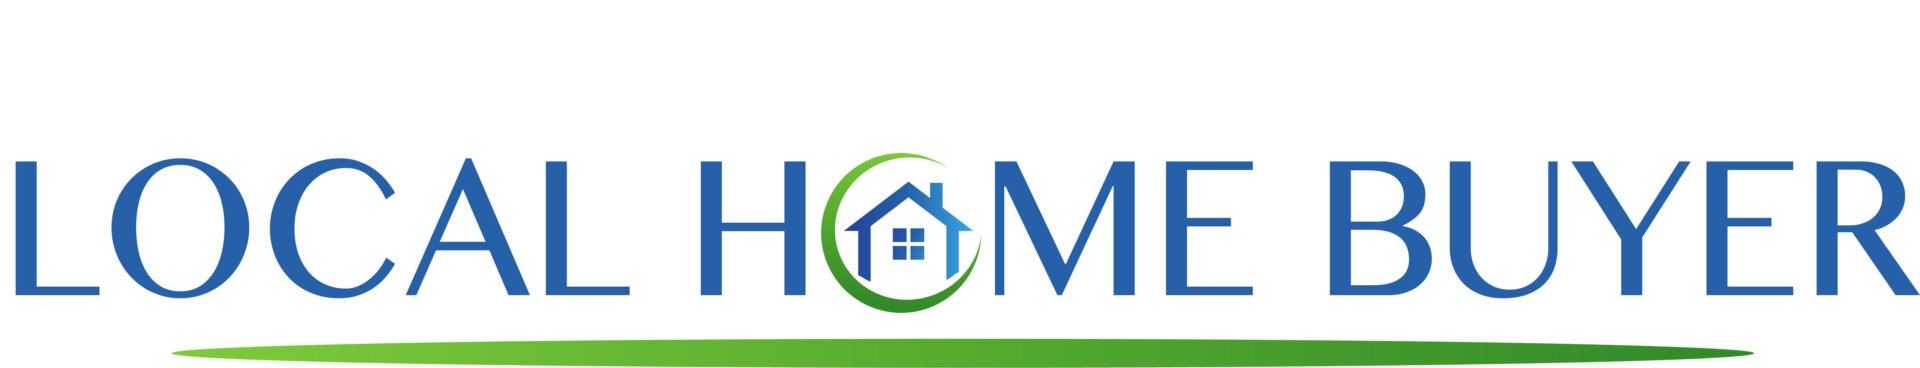 Local Home Buyer logo